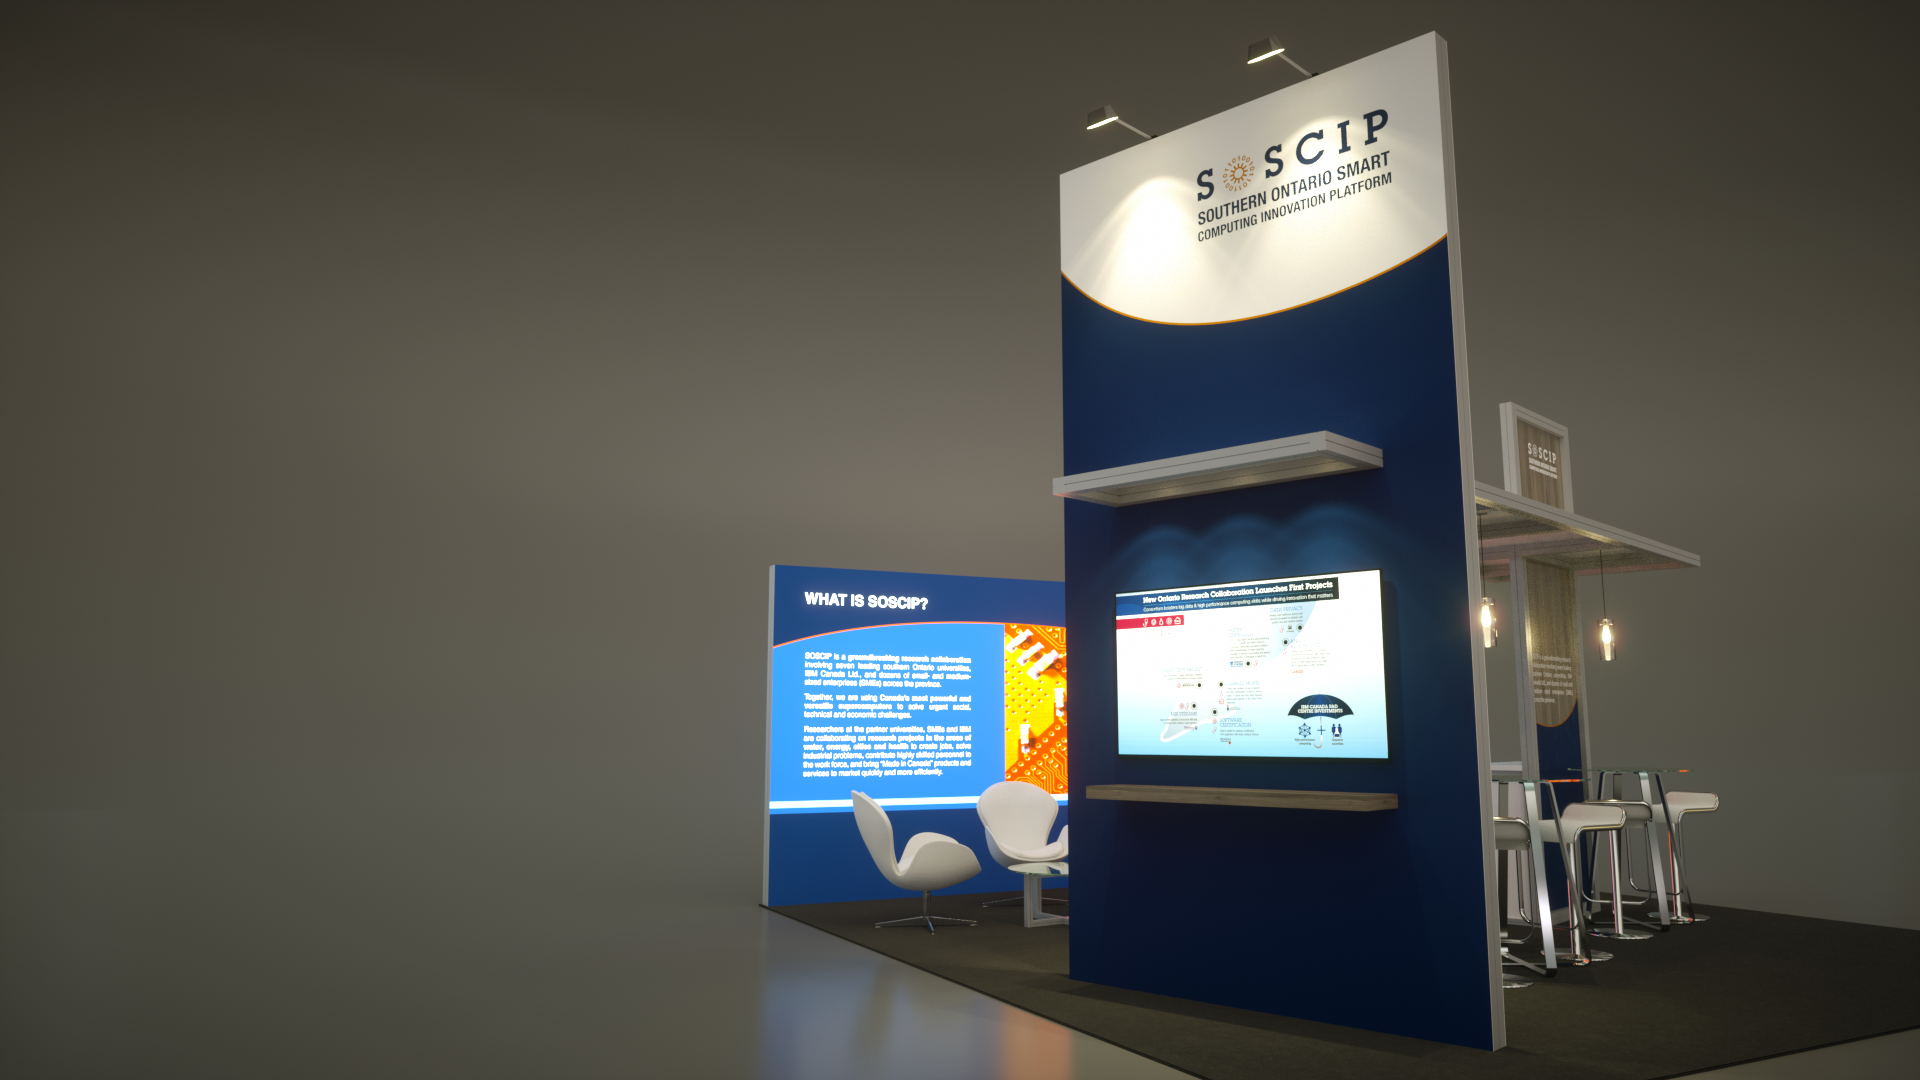 2906 - UofT - SOSCIP - OCE Discovery 2015 - 2.jpg